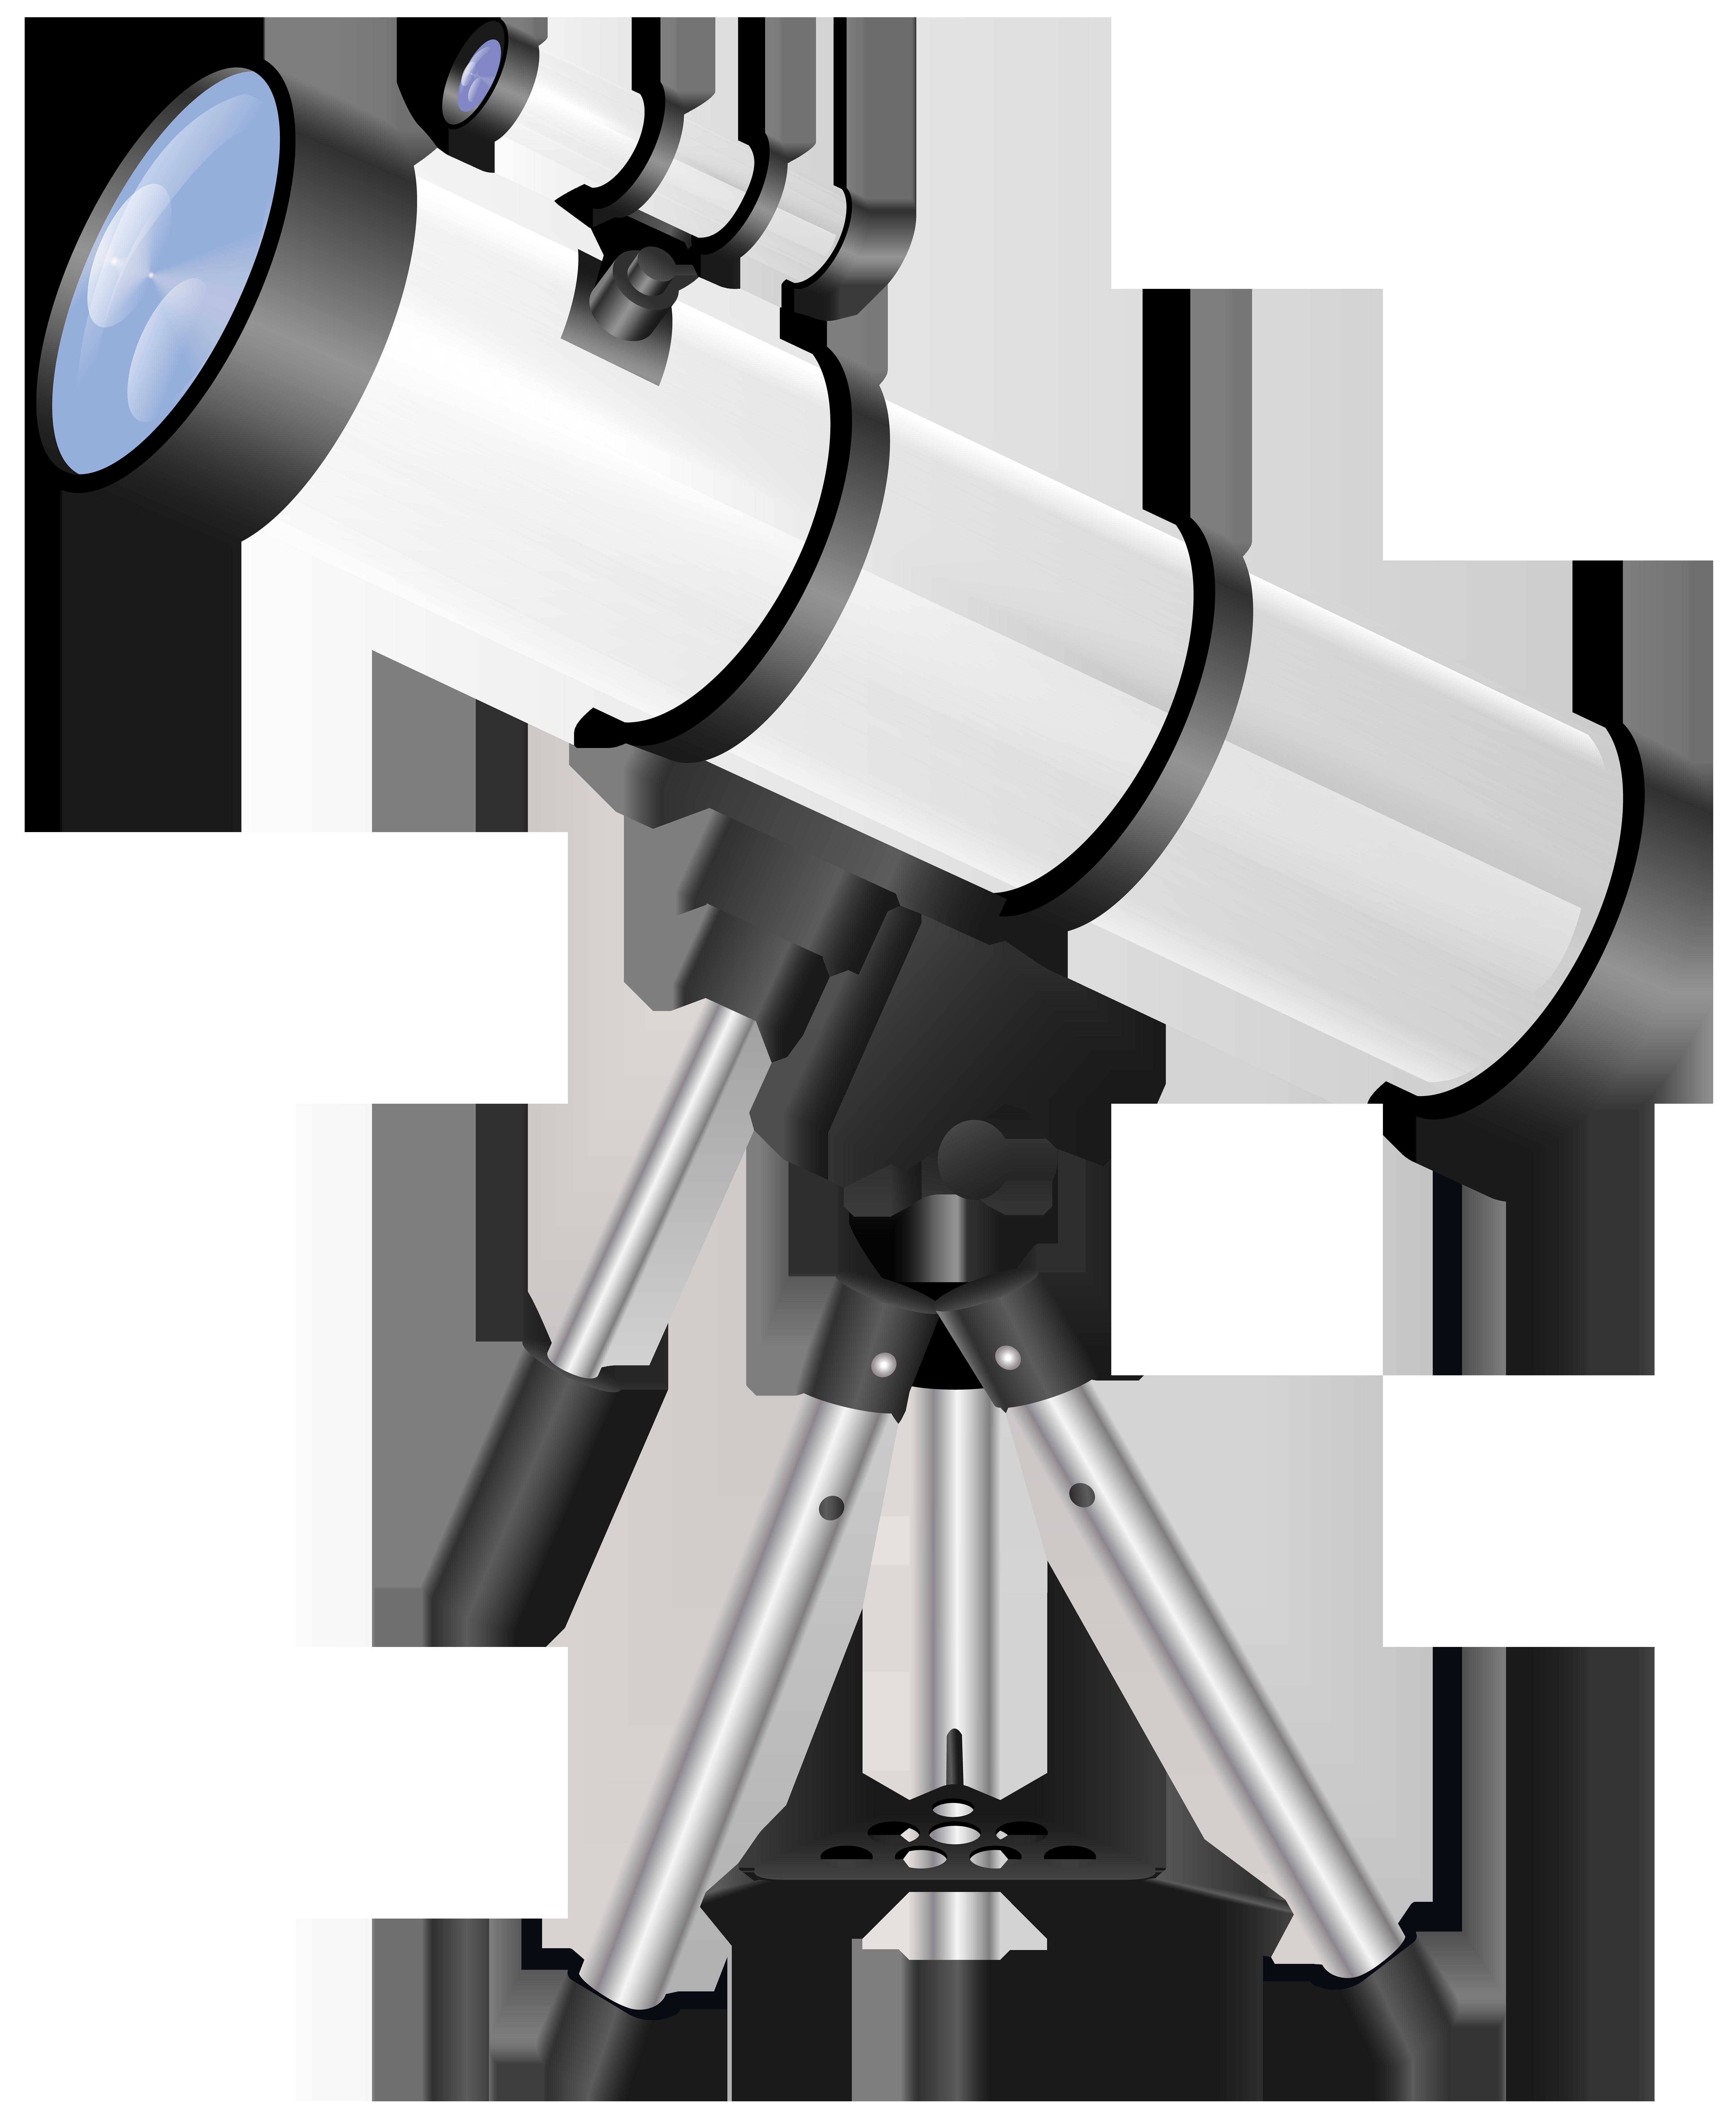 Telescope Clipart Free.